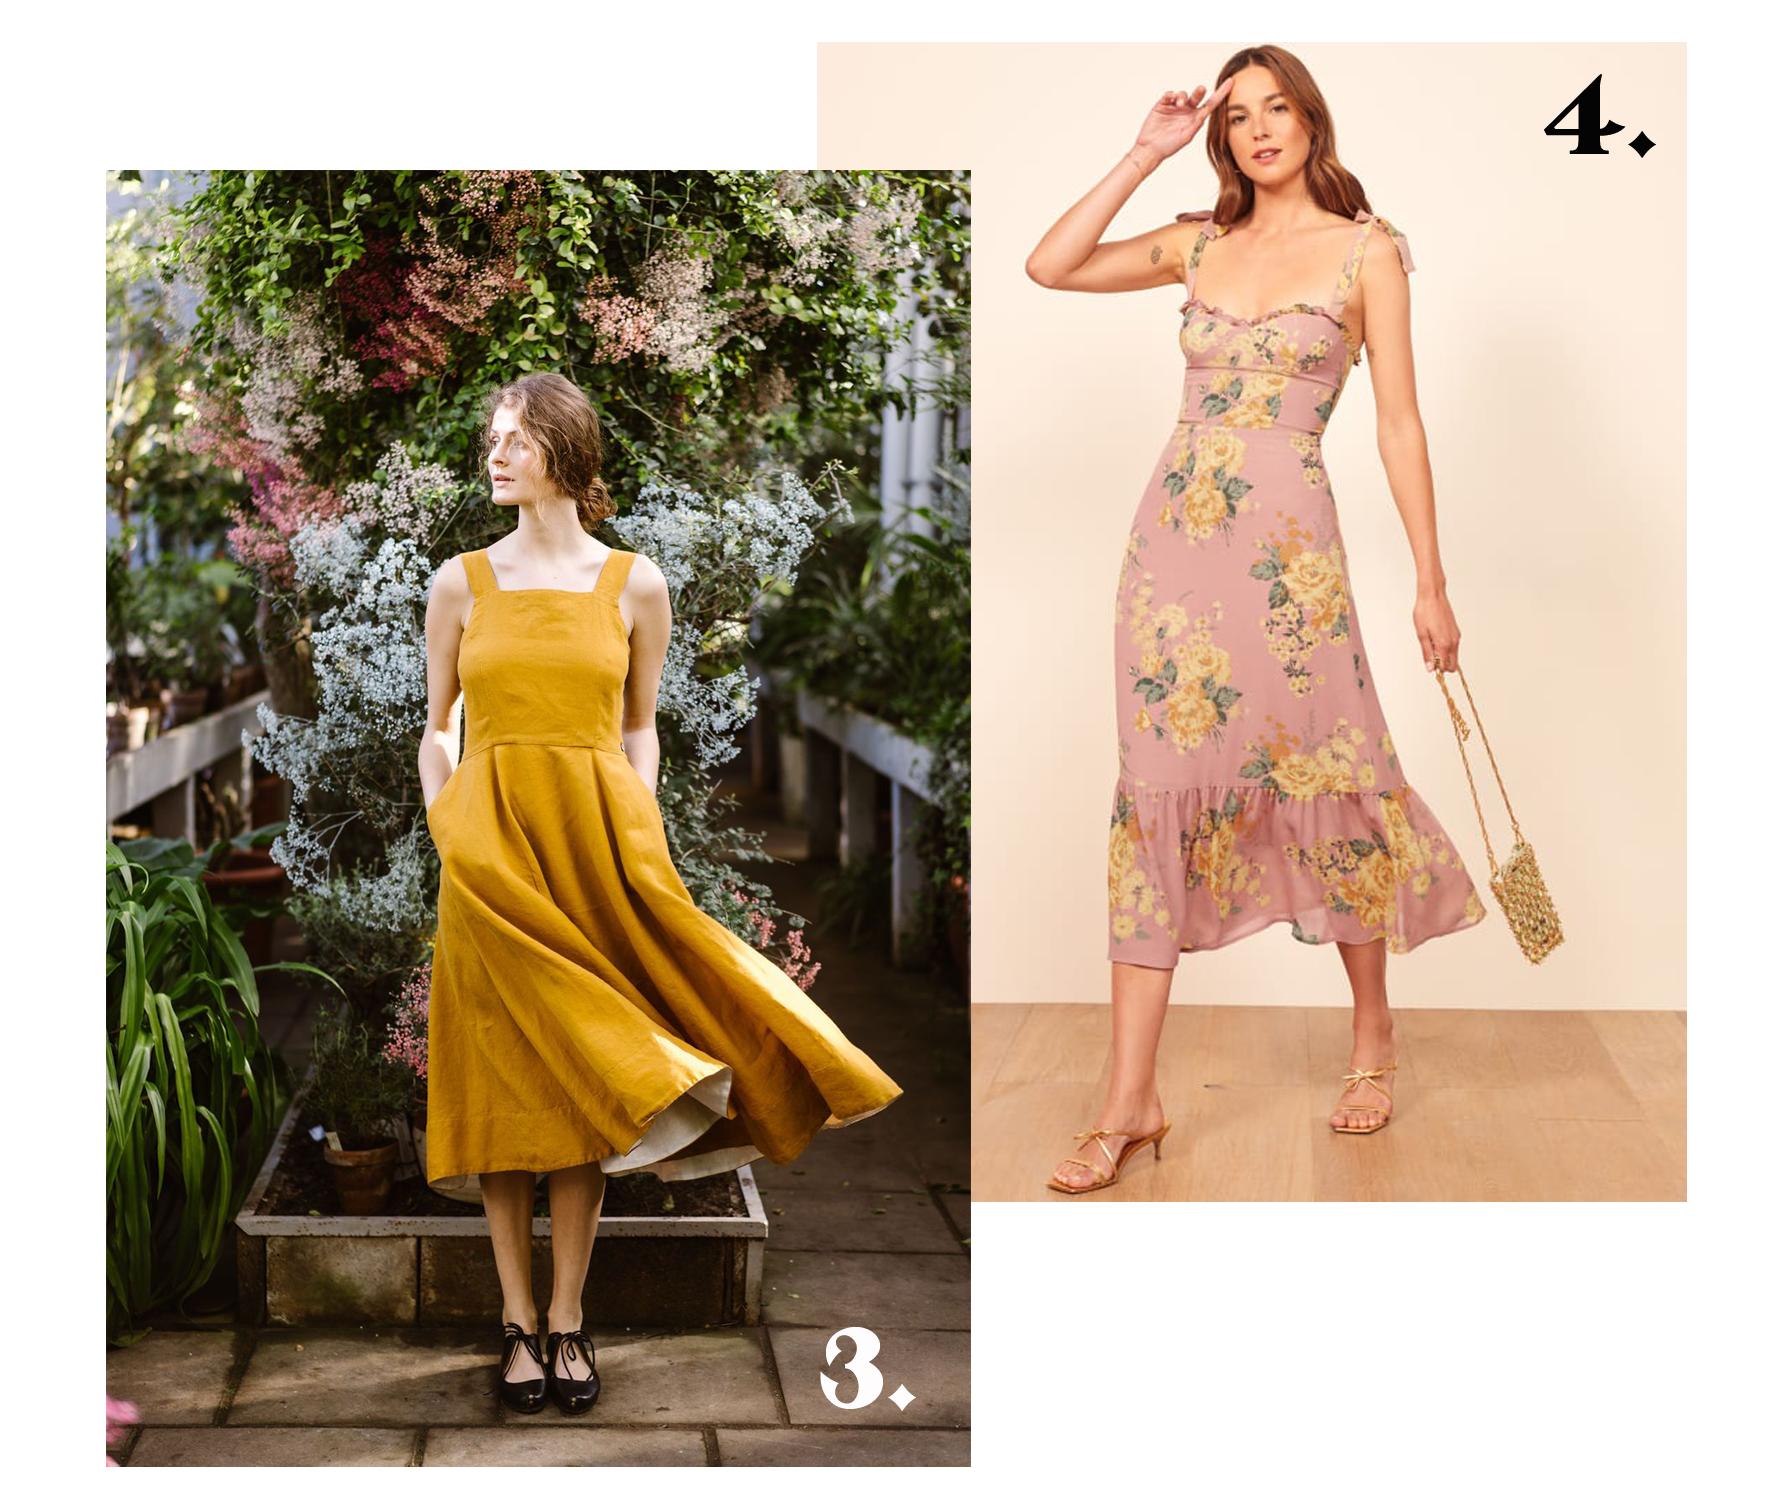 dresses-2.png